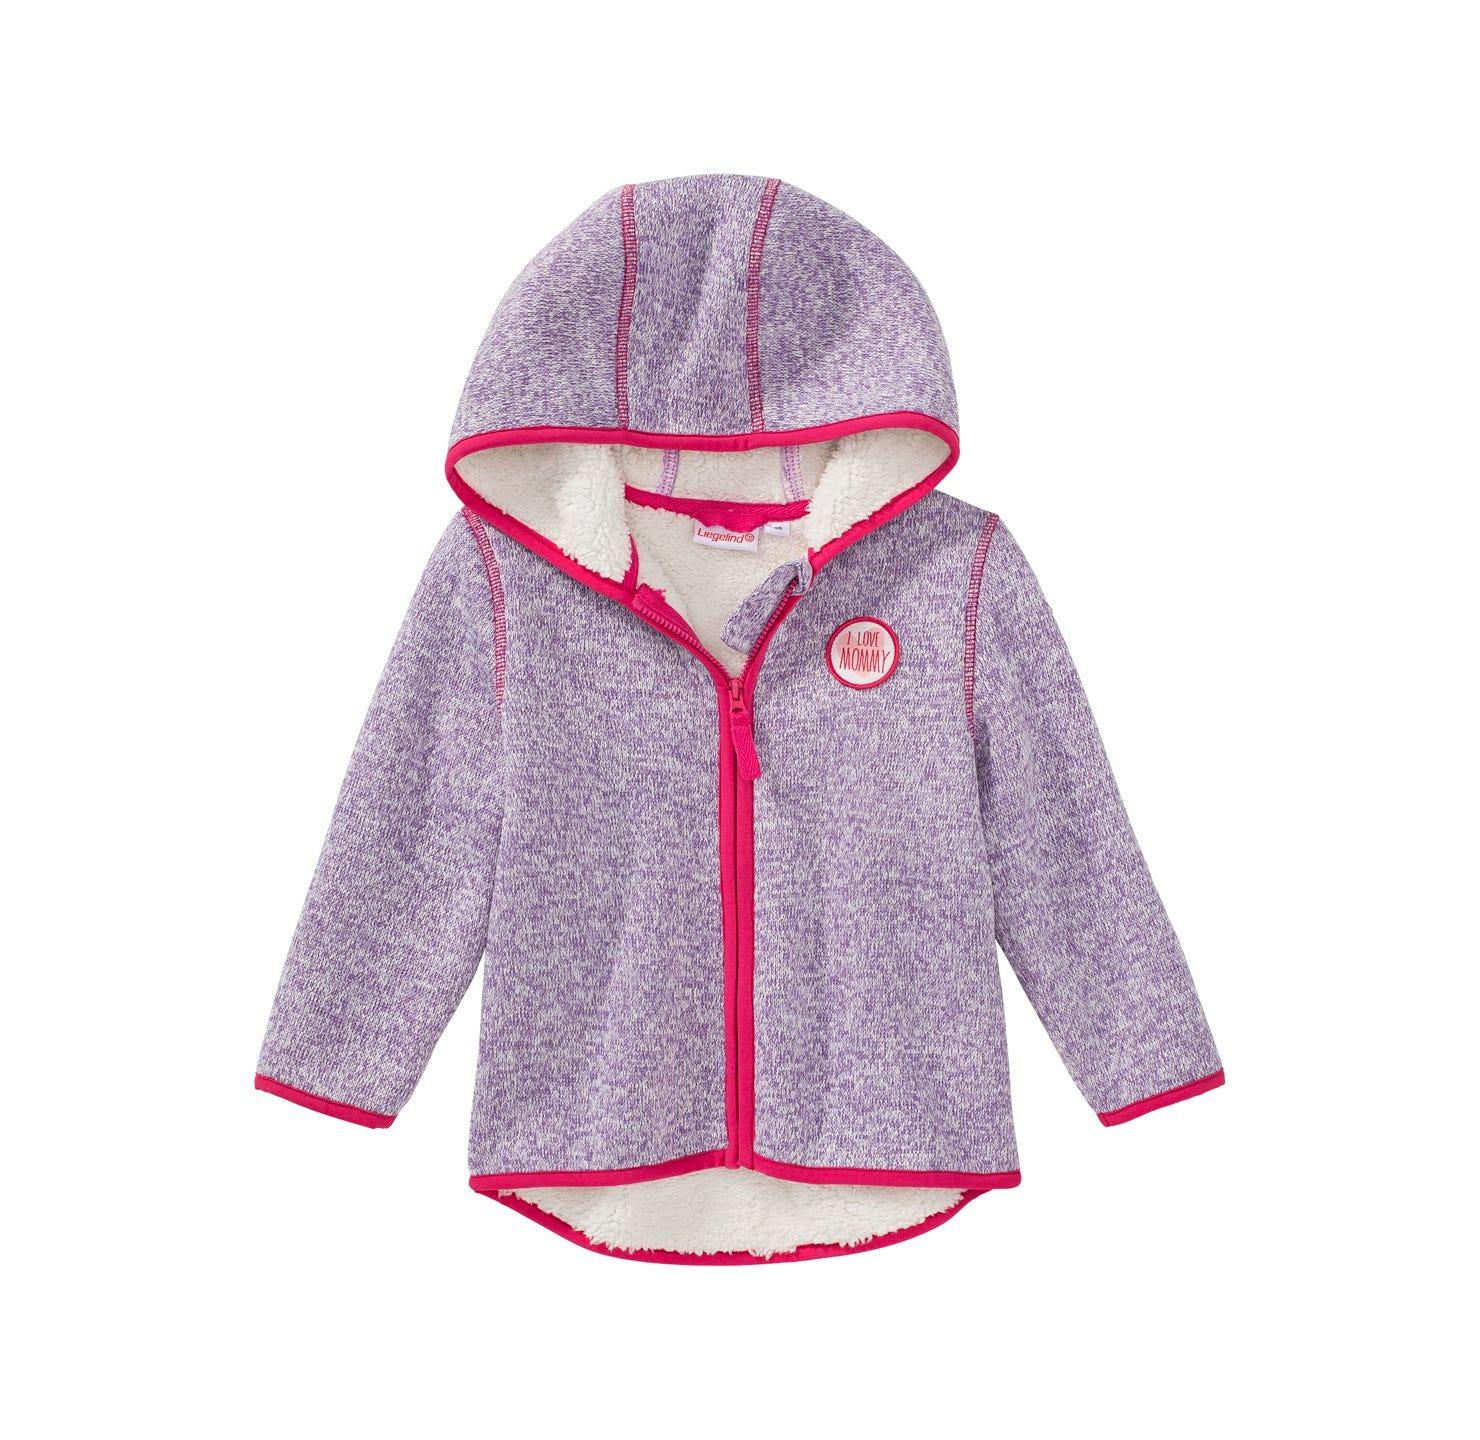 Baby Mädchen Strickfleece Jacke mit Teddy Futter | NKD